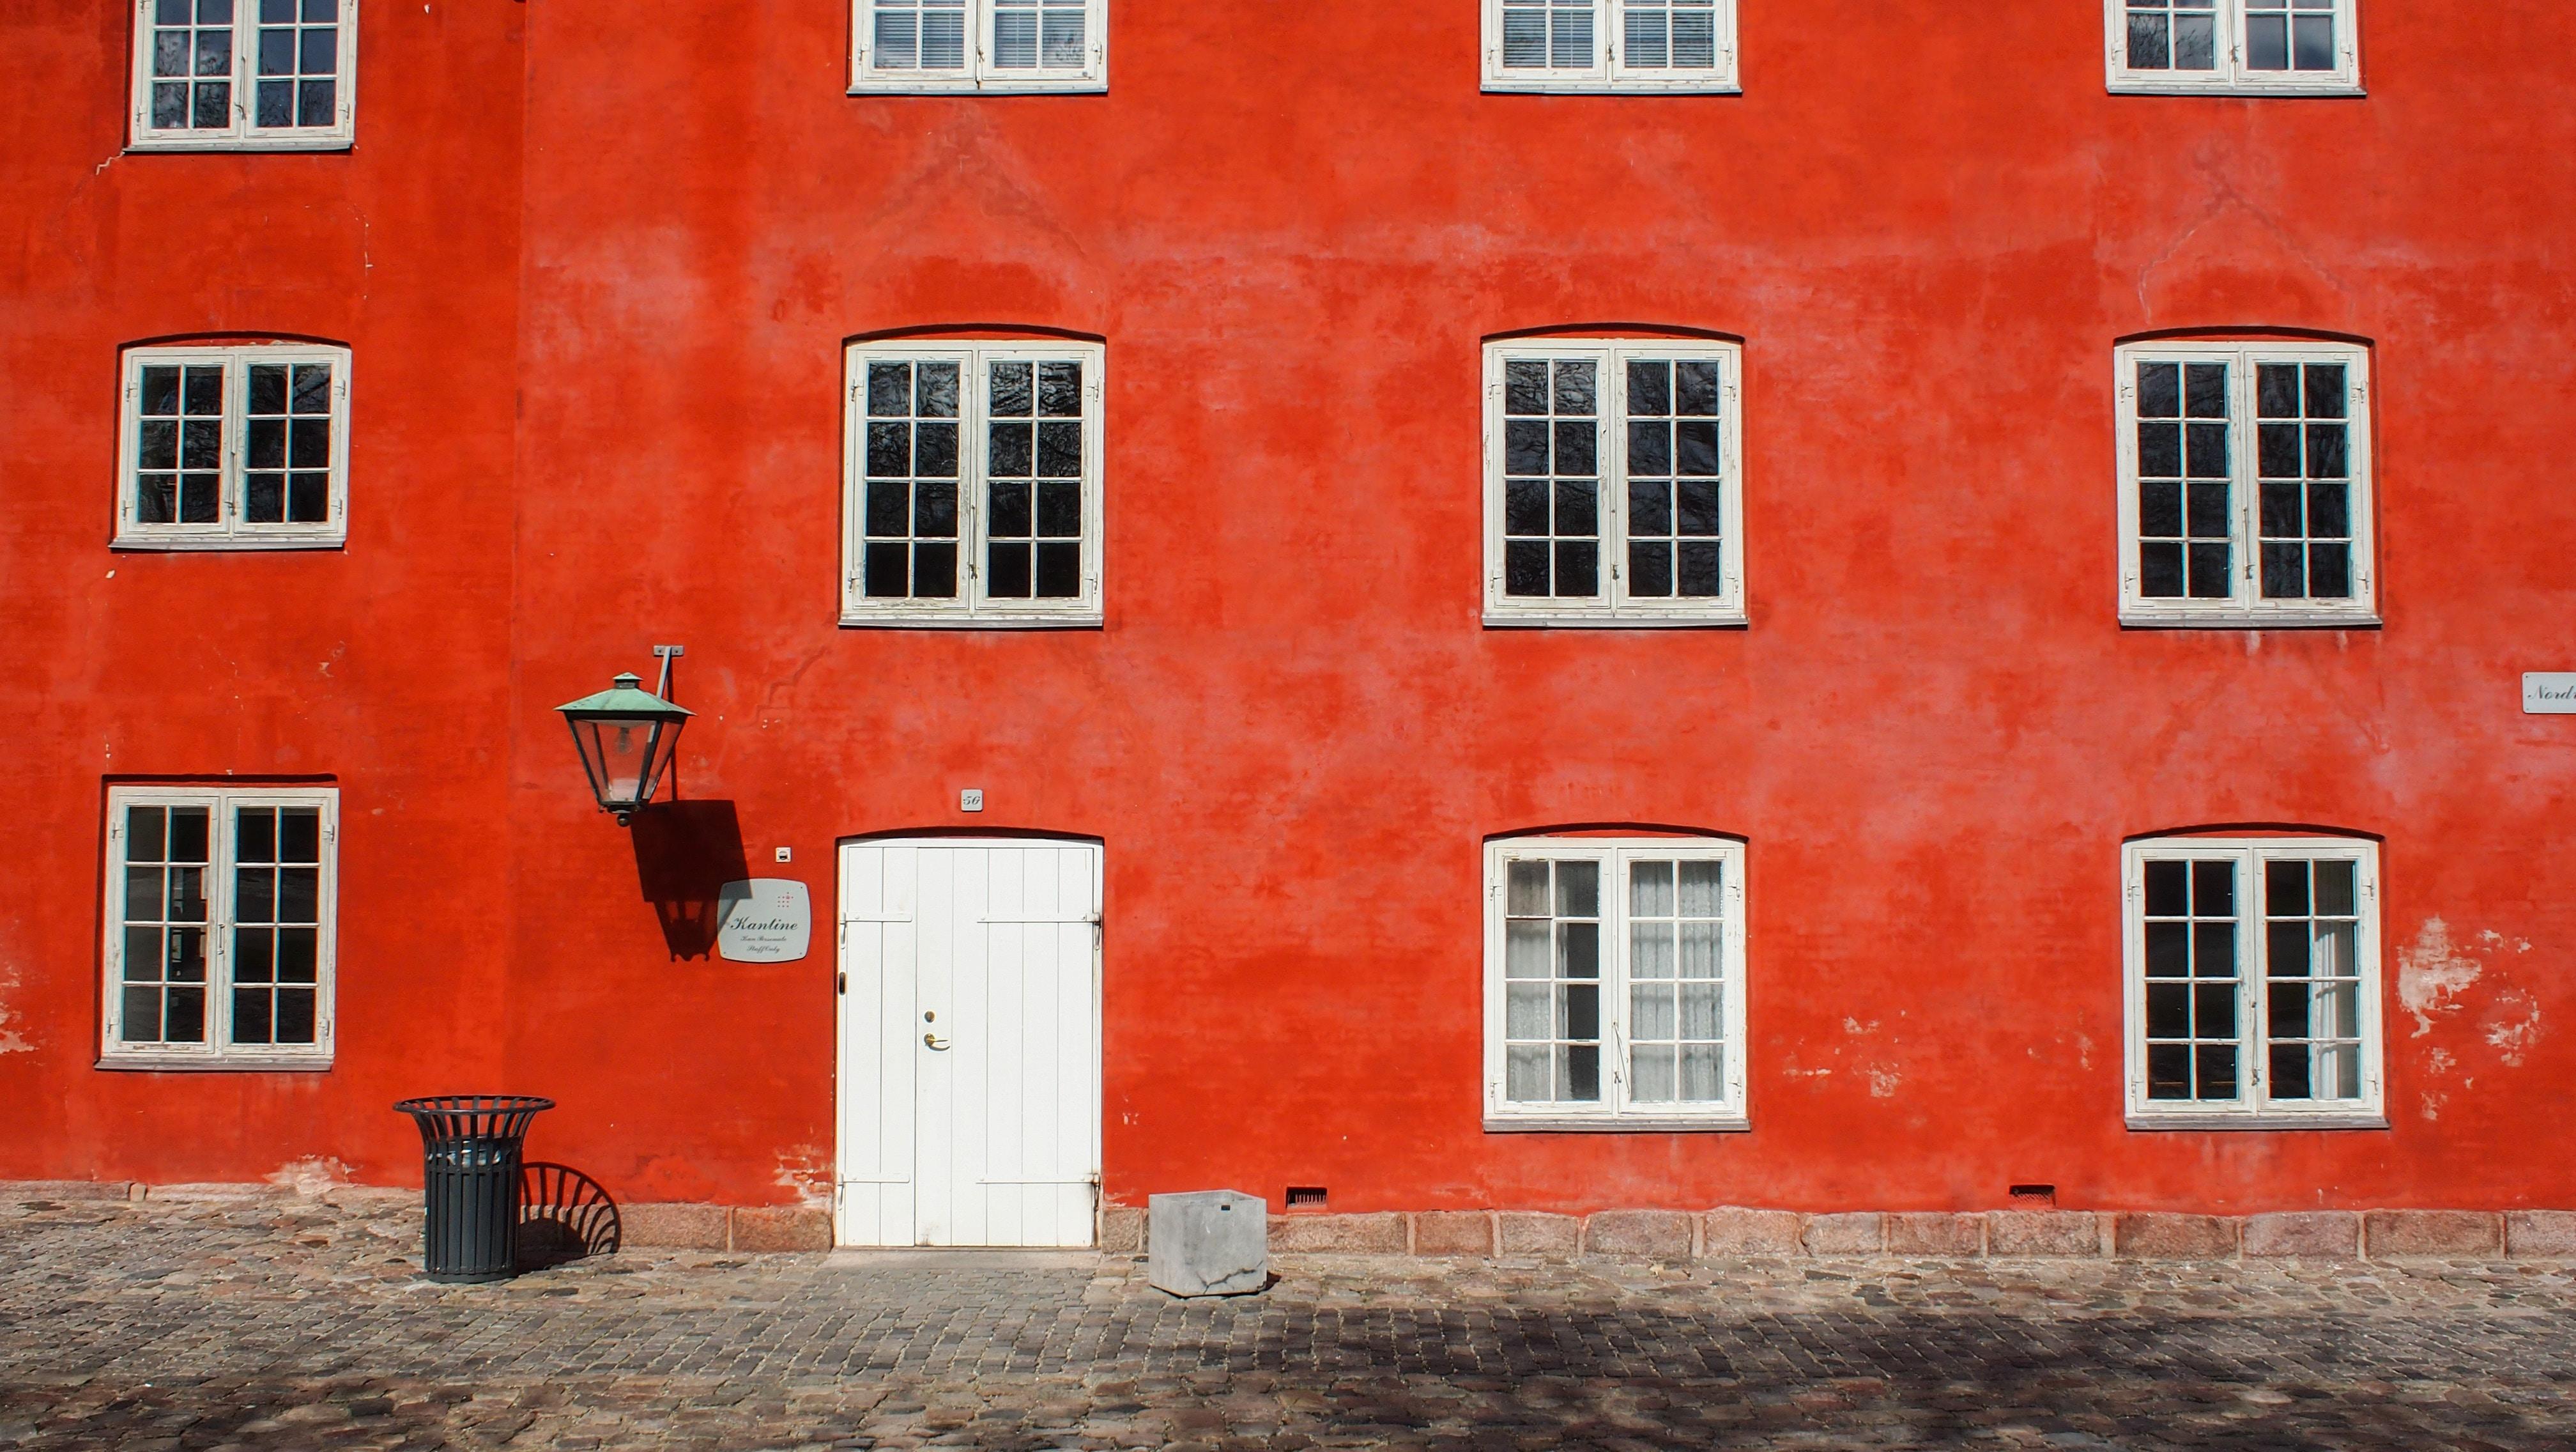 closeup photo of red concrete building